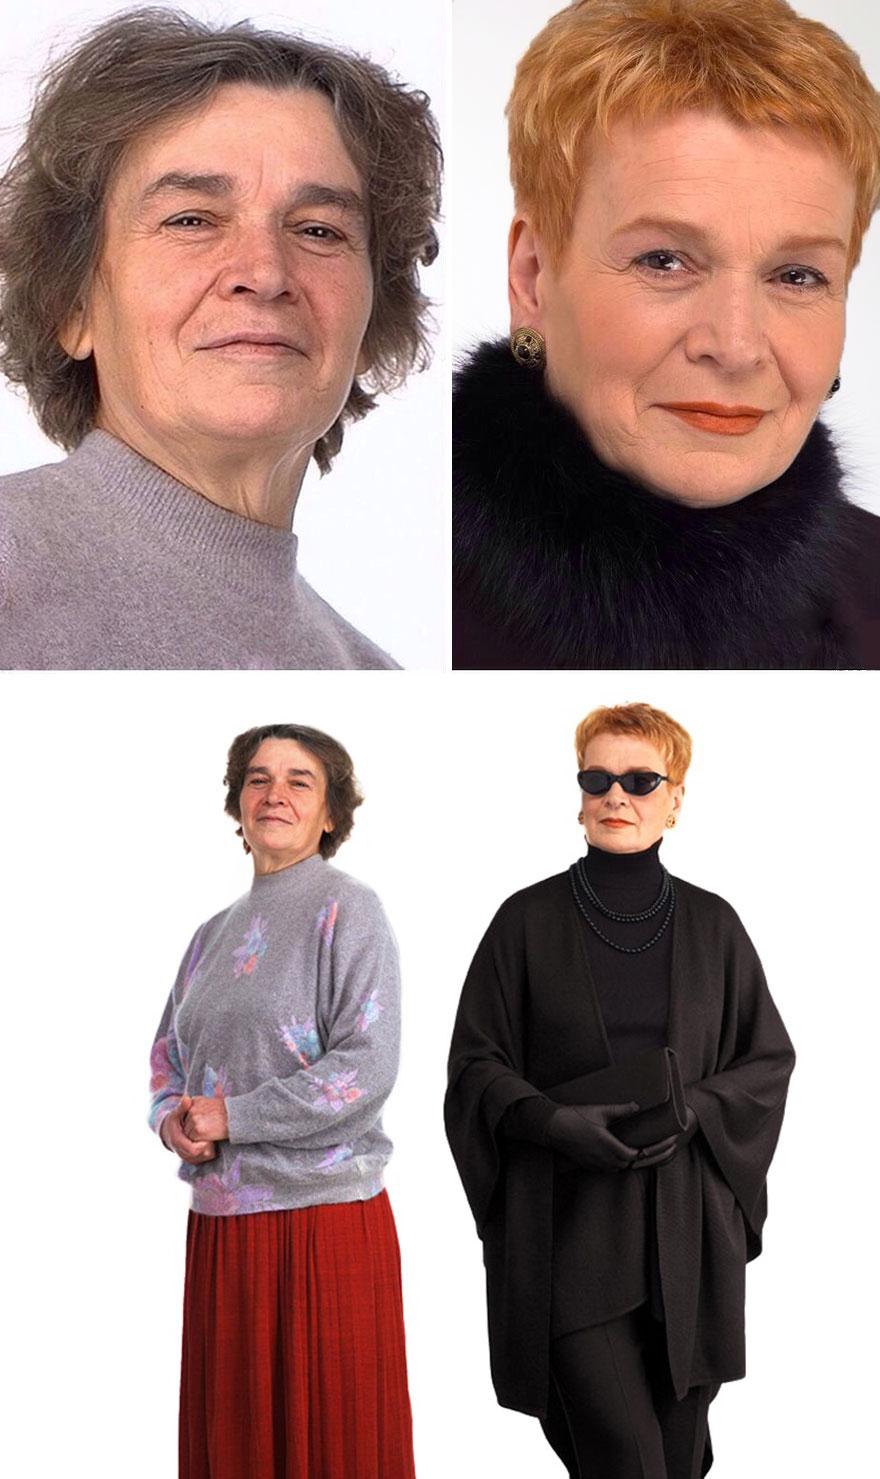 before-after-makeup-woman-style-change-konstantin-bogomolov-1